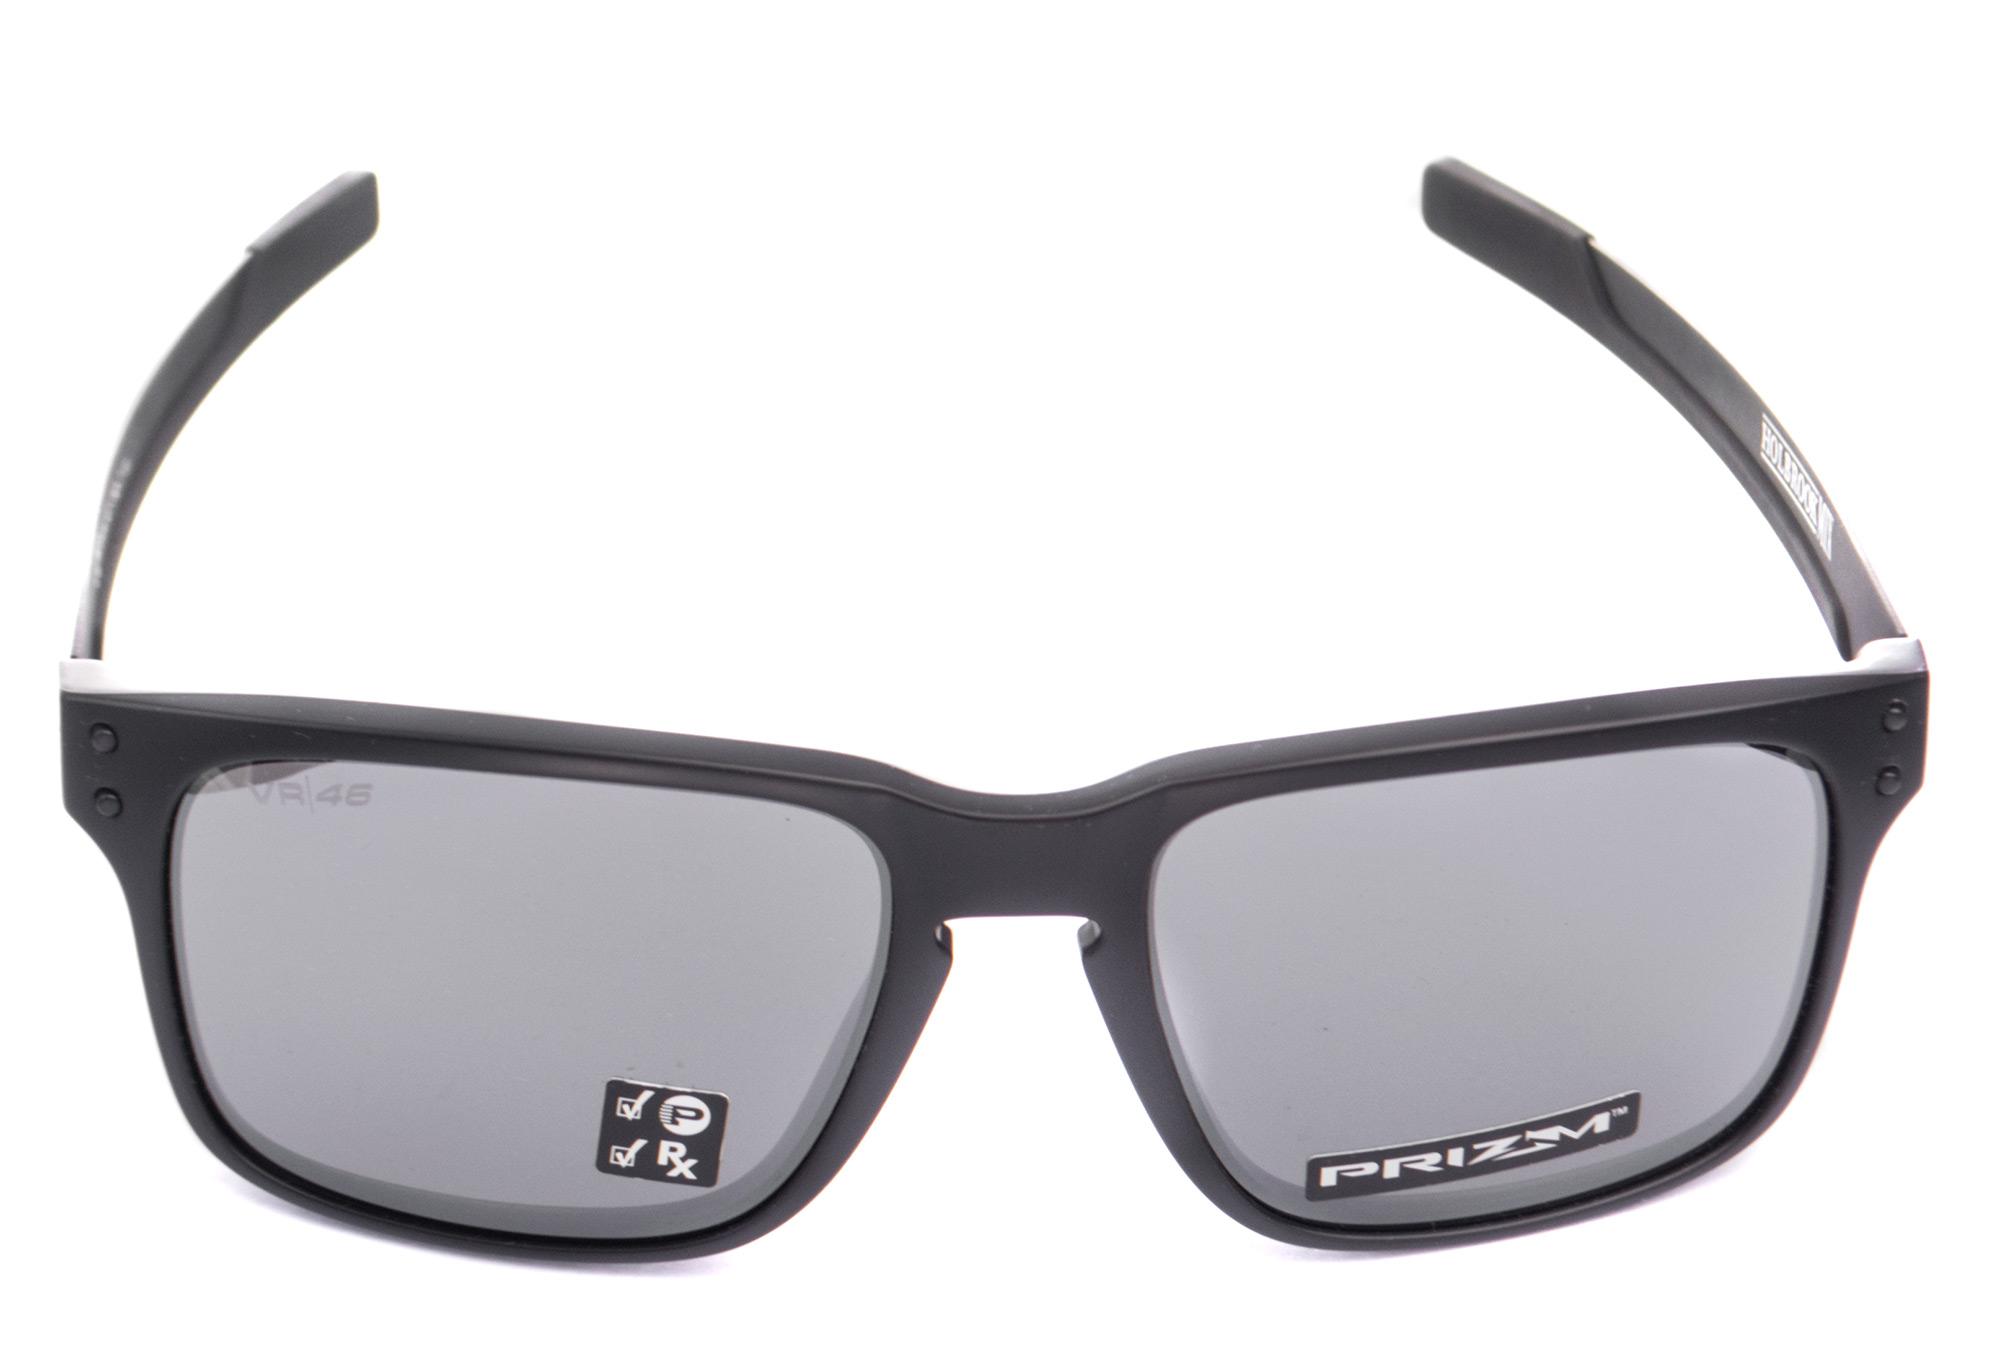 b33d918fadb Oakley Holbrook Mix VR46 Glasses Matte Black   Prizm Black Polarized  OO9384-1457